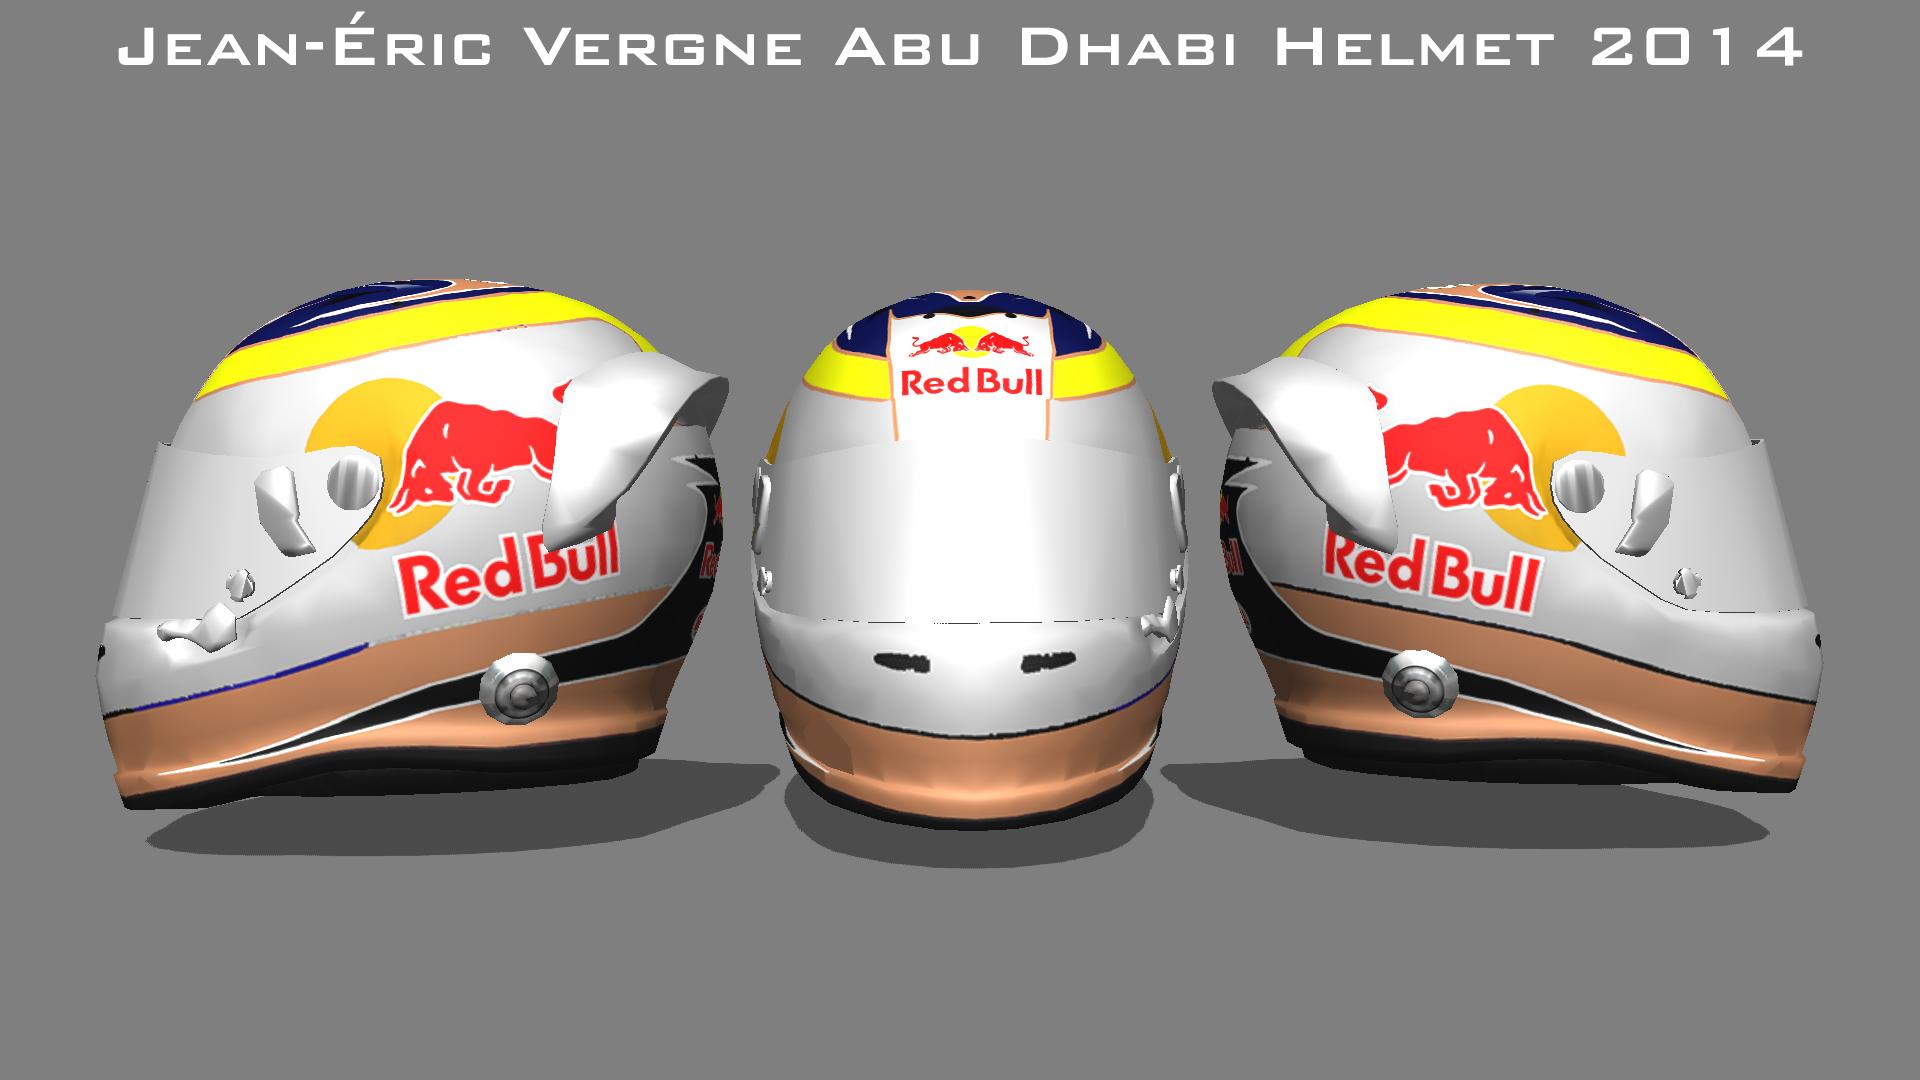 Jean-Éric Vergne Abu Dhabi Helmet 2014.jpg